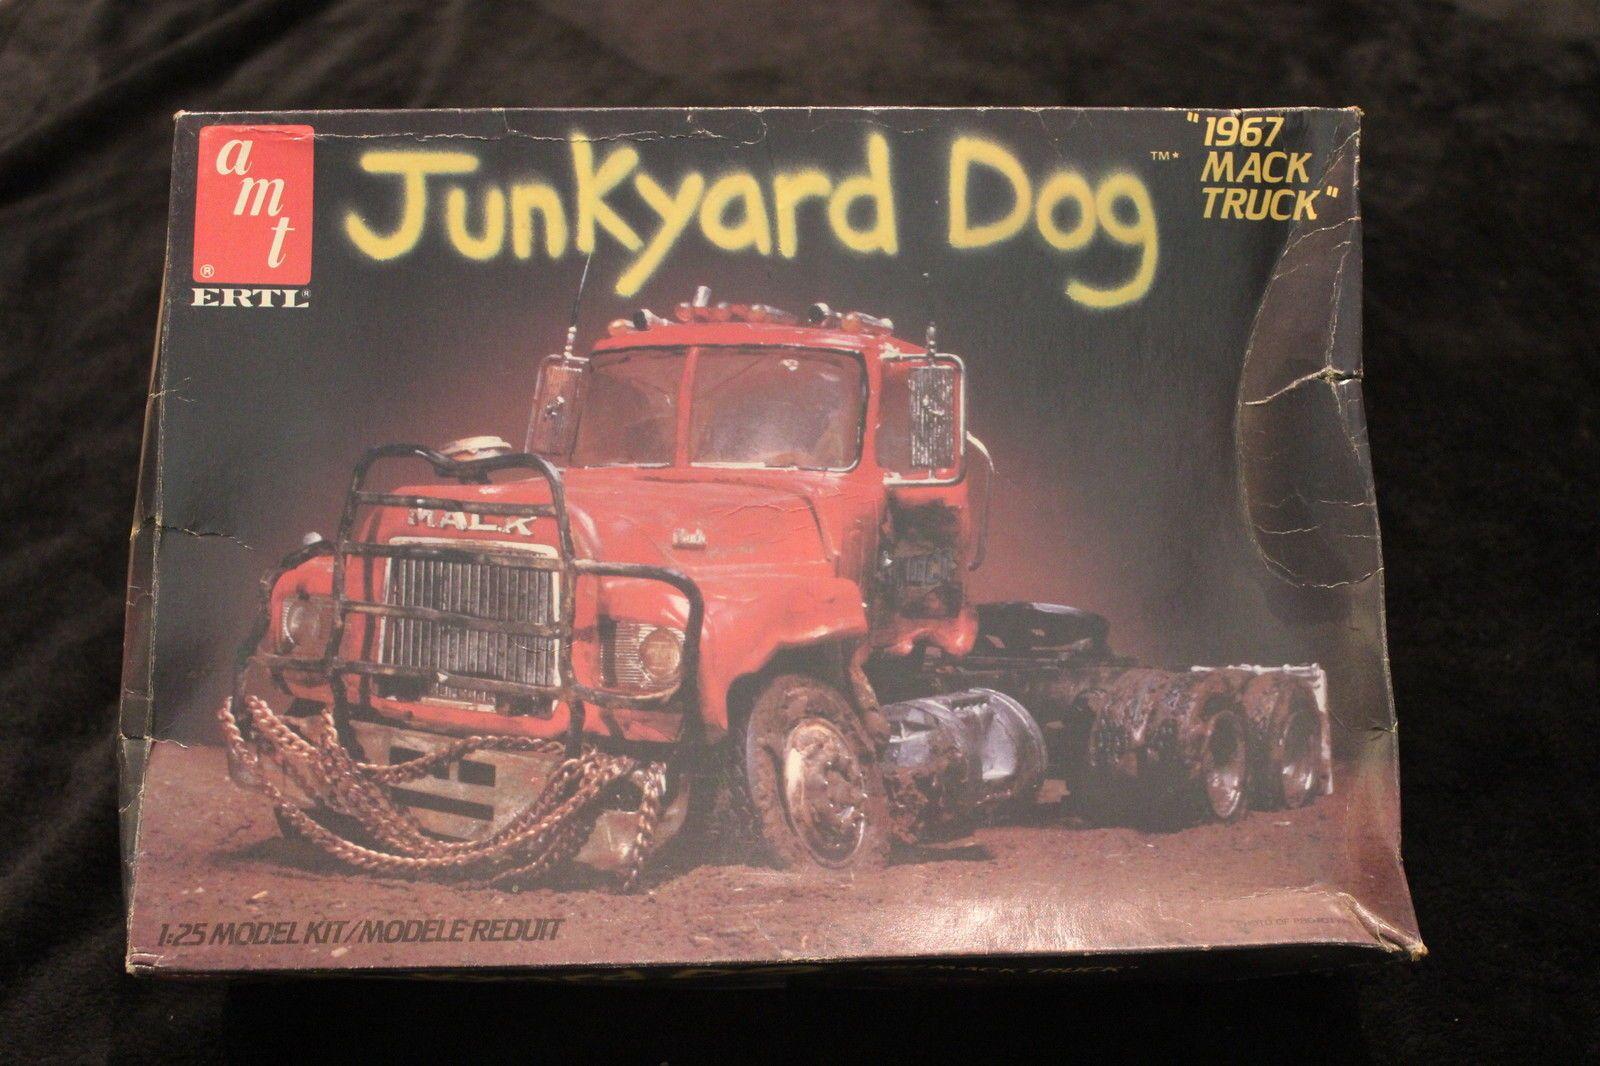 Amt ertl 6653 junkyard dog 1967 mack truck 1/25 scale